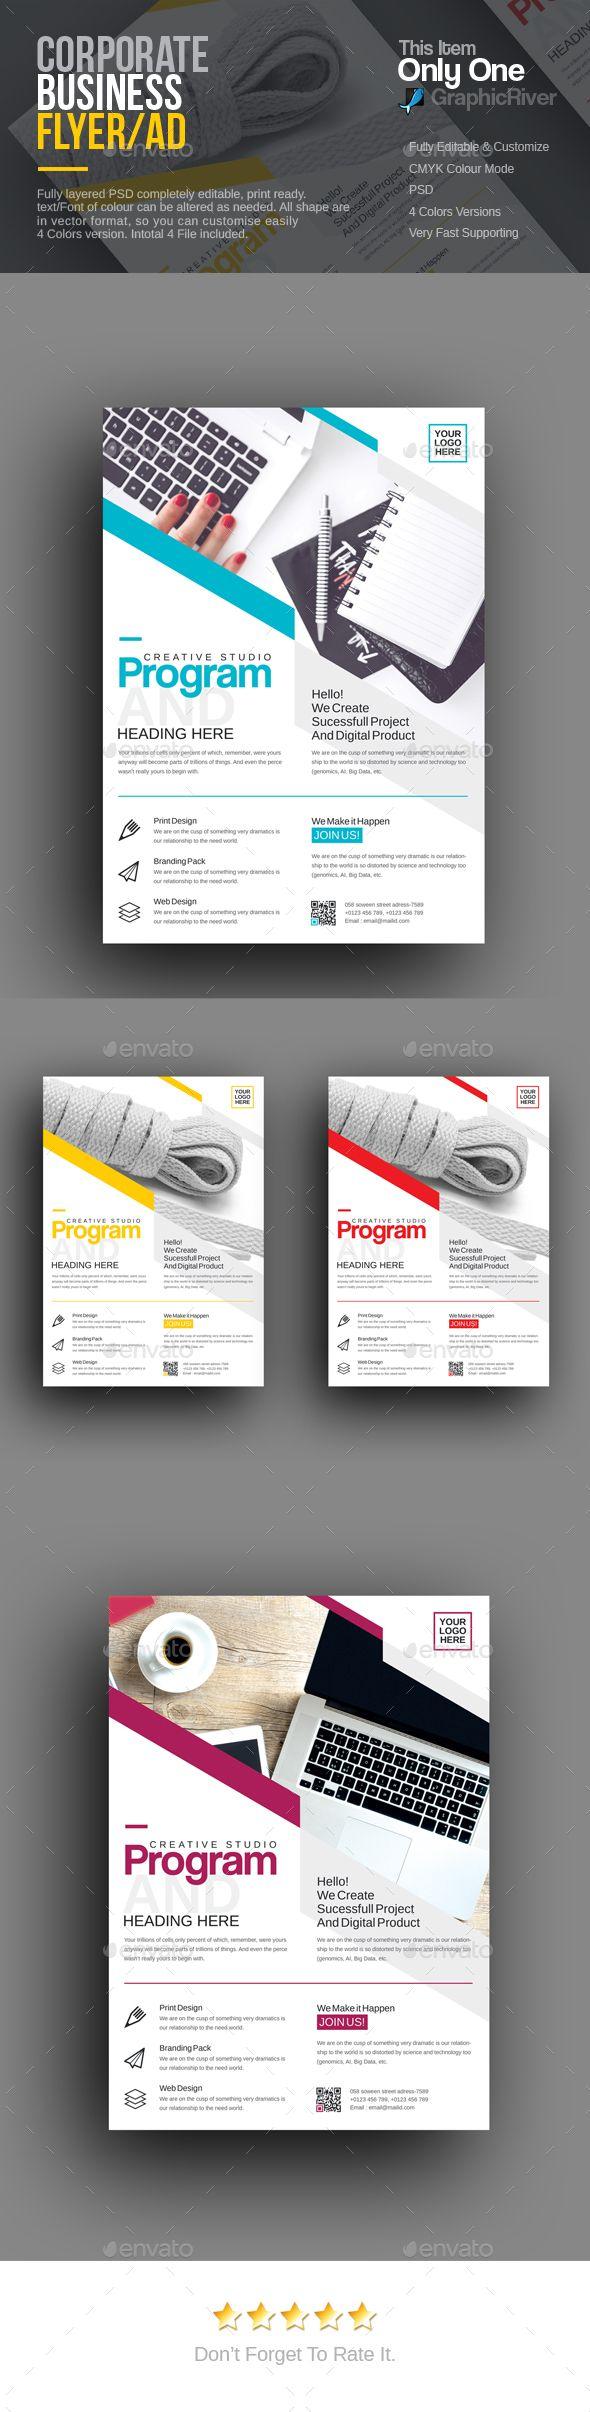 design business flyers vatoz atozdevelopment co